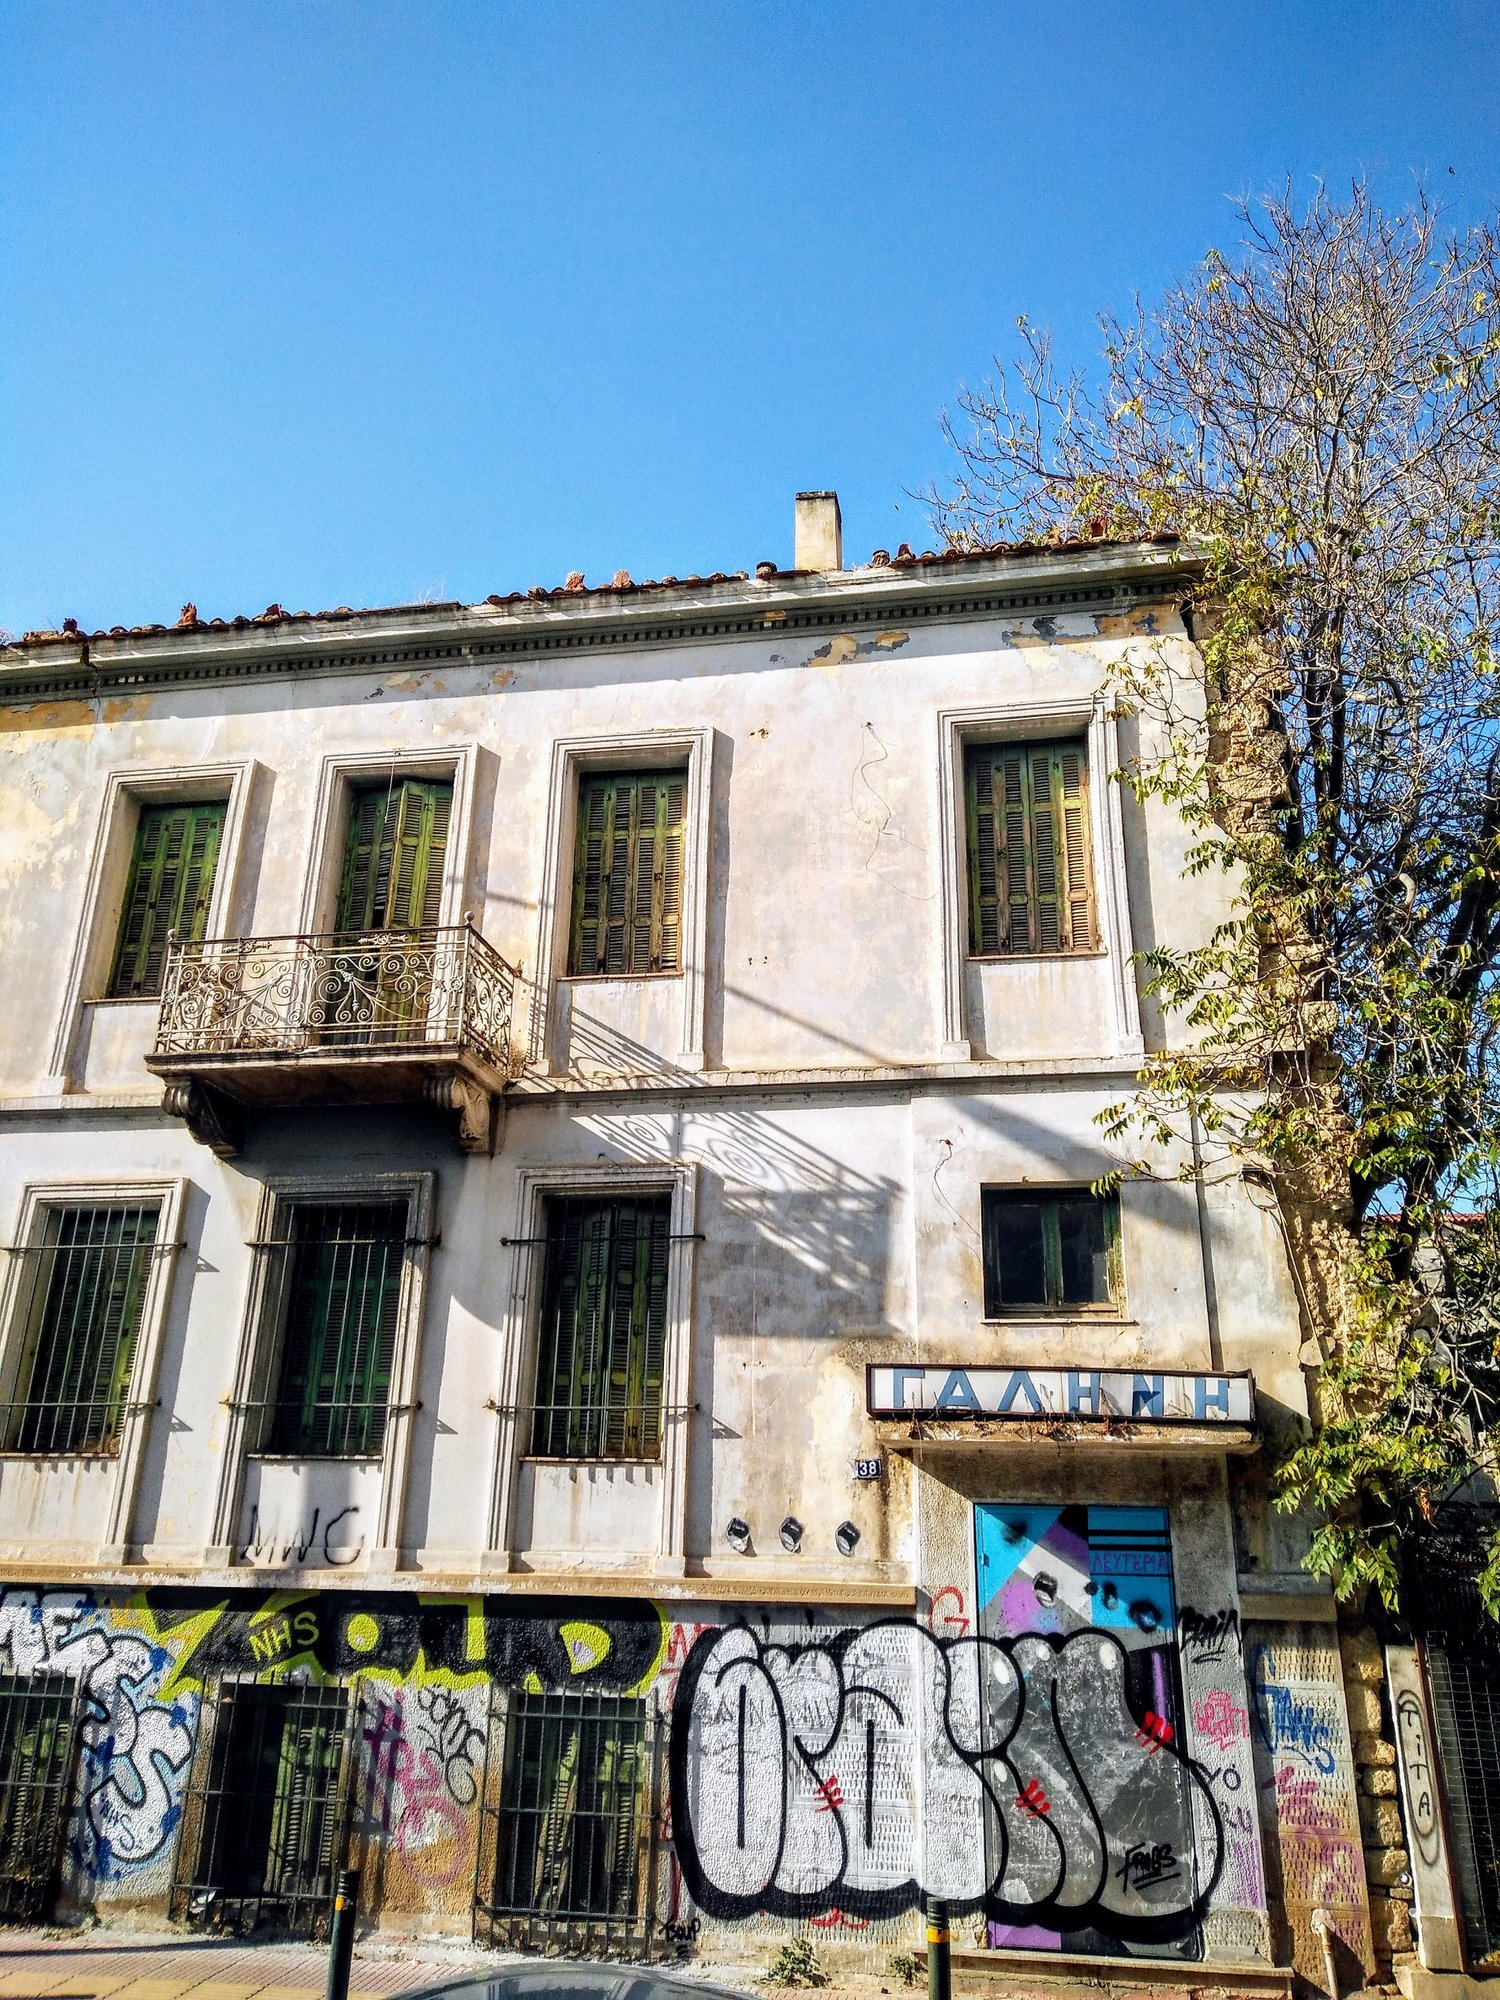 Urban feeling in Keramikos neighborhood. Source: Truevoyagers